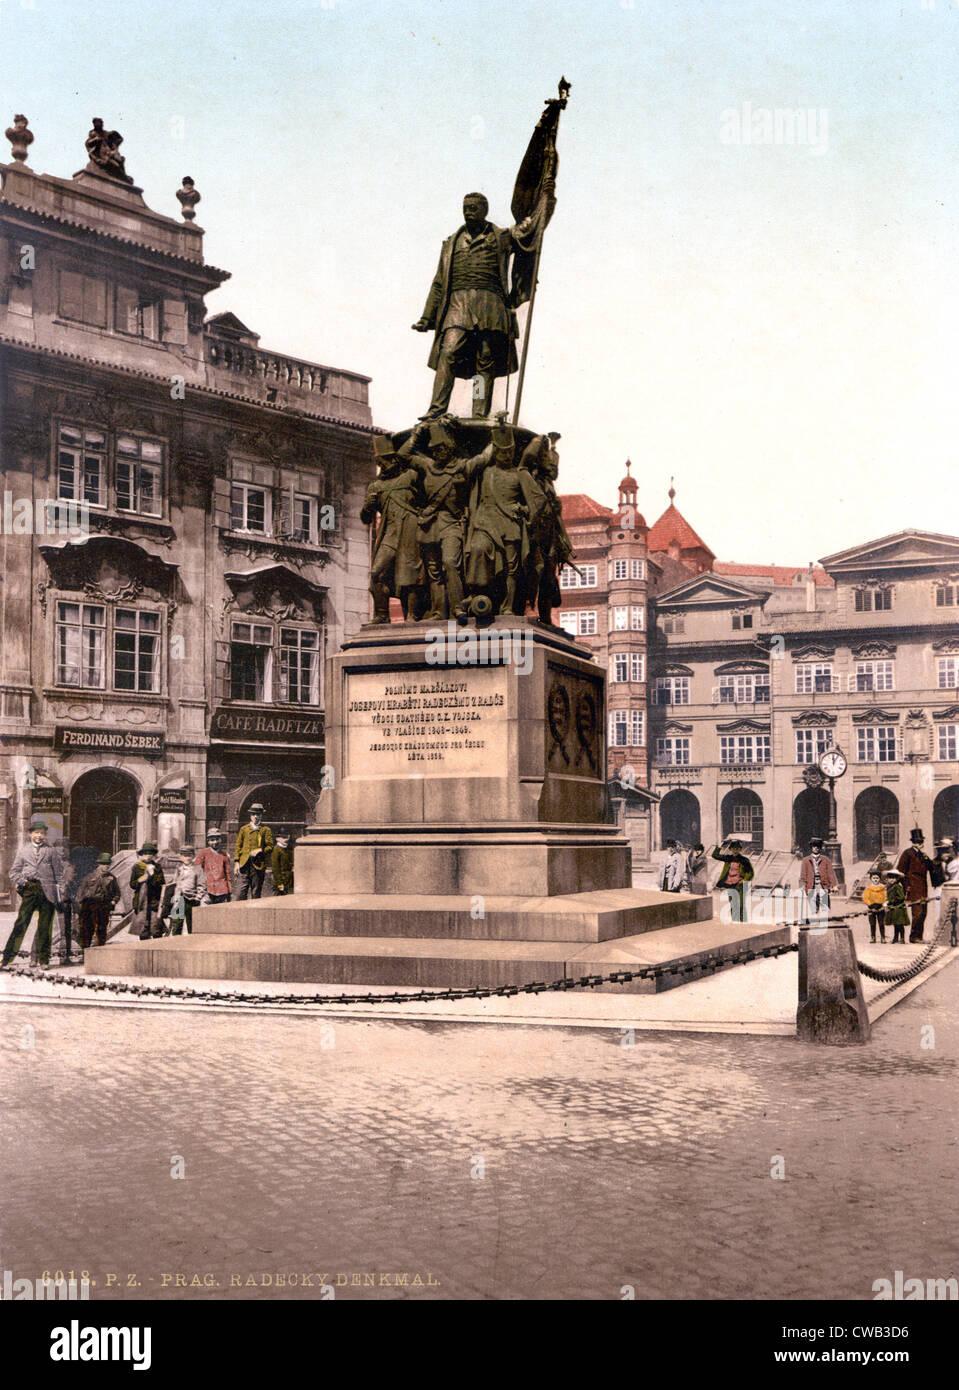 Prague, Joseph Radetzky Memorial, Bohemia, Austro-Hungary, photochrom, circa 1900. - Stock Image